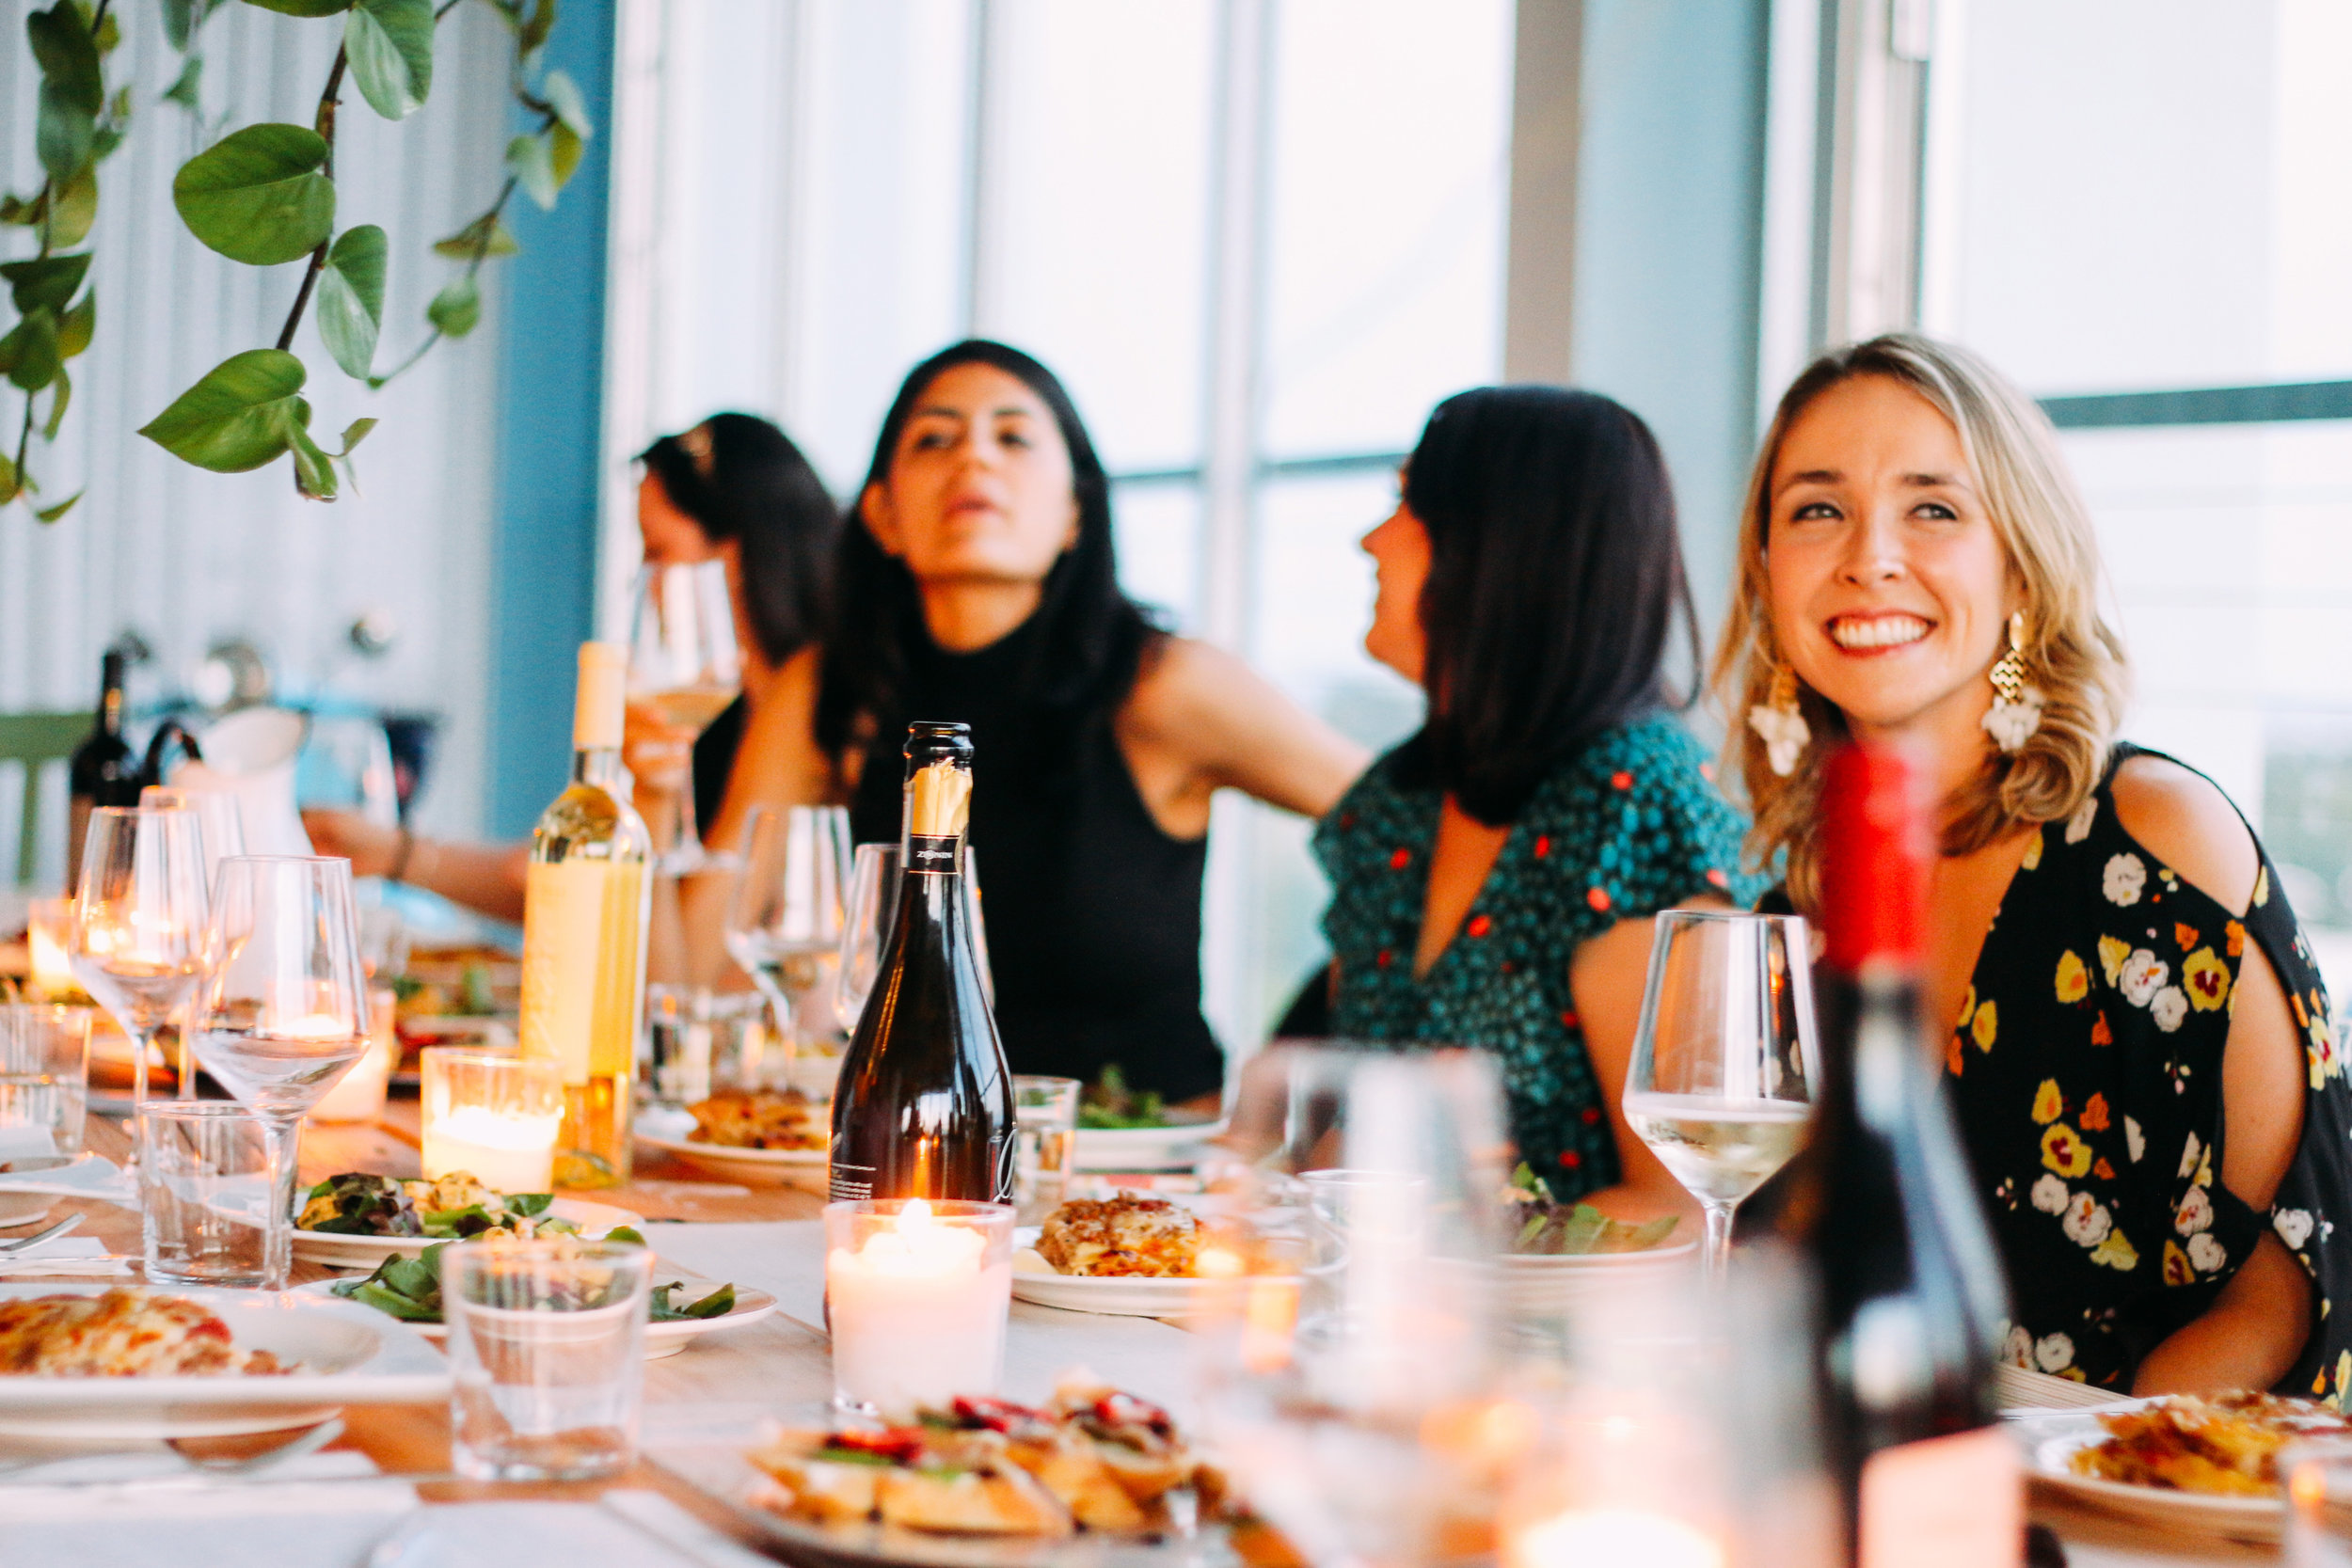 Women Who Wine Uncorked Conversations-Miami Wine Events-Wine Tasting Miami-61.jpg